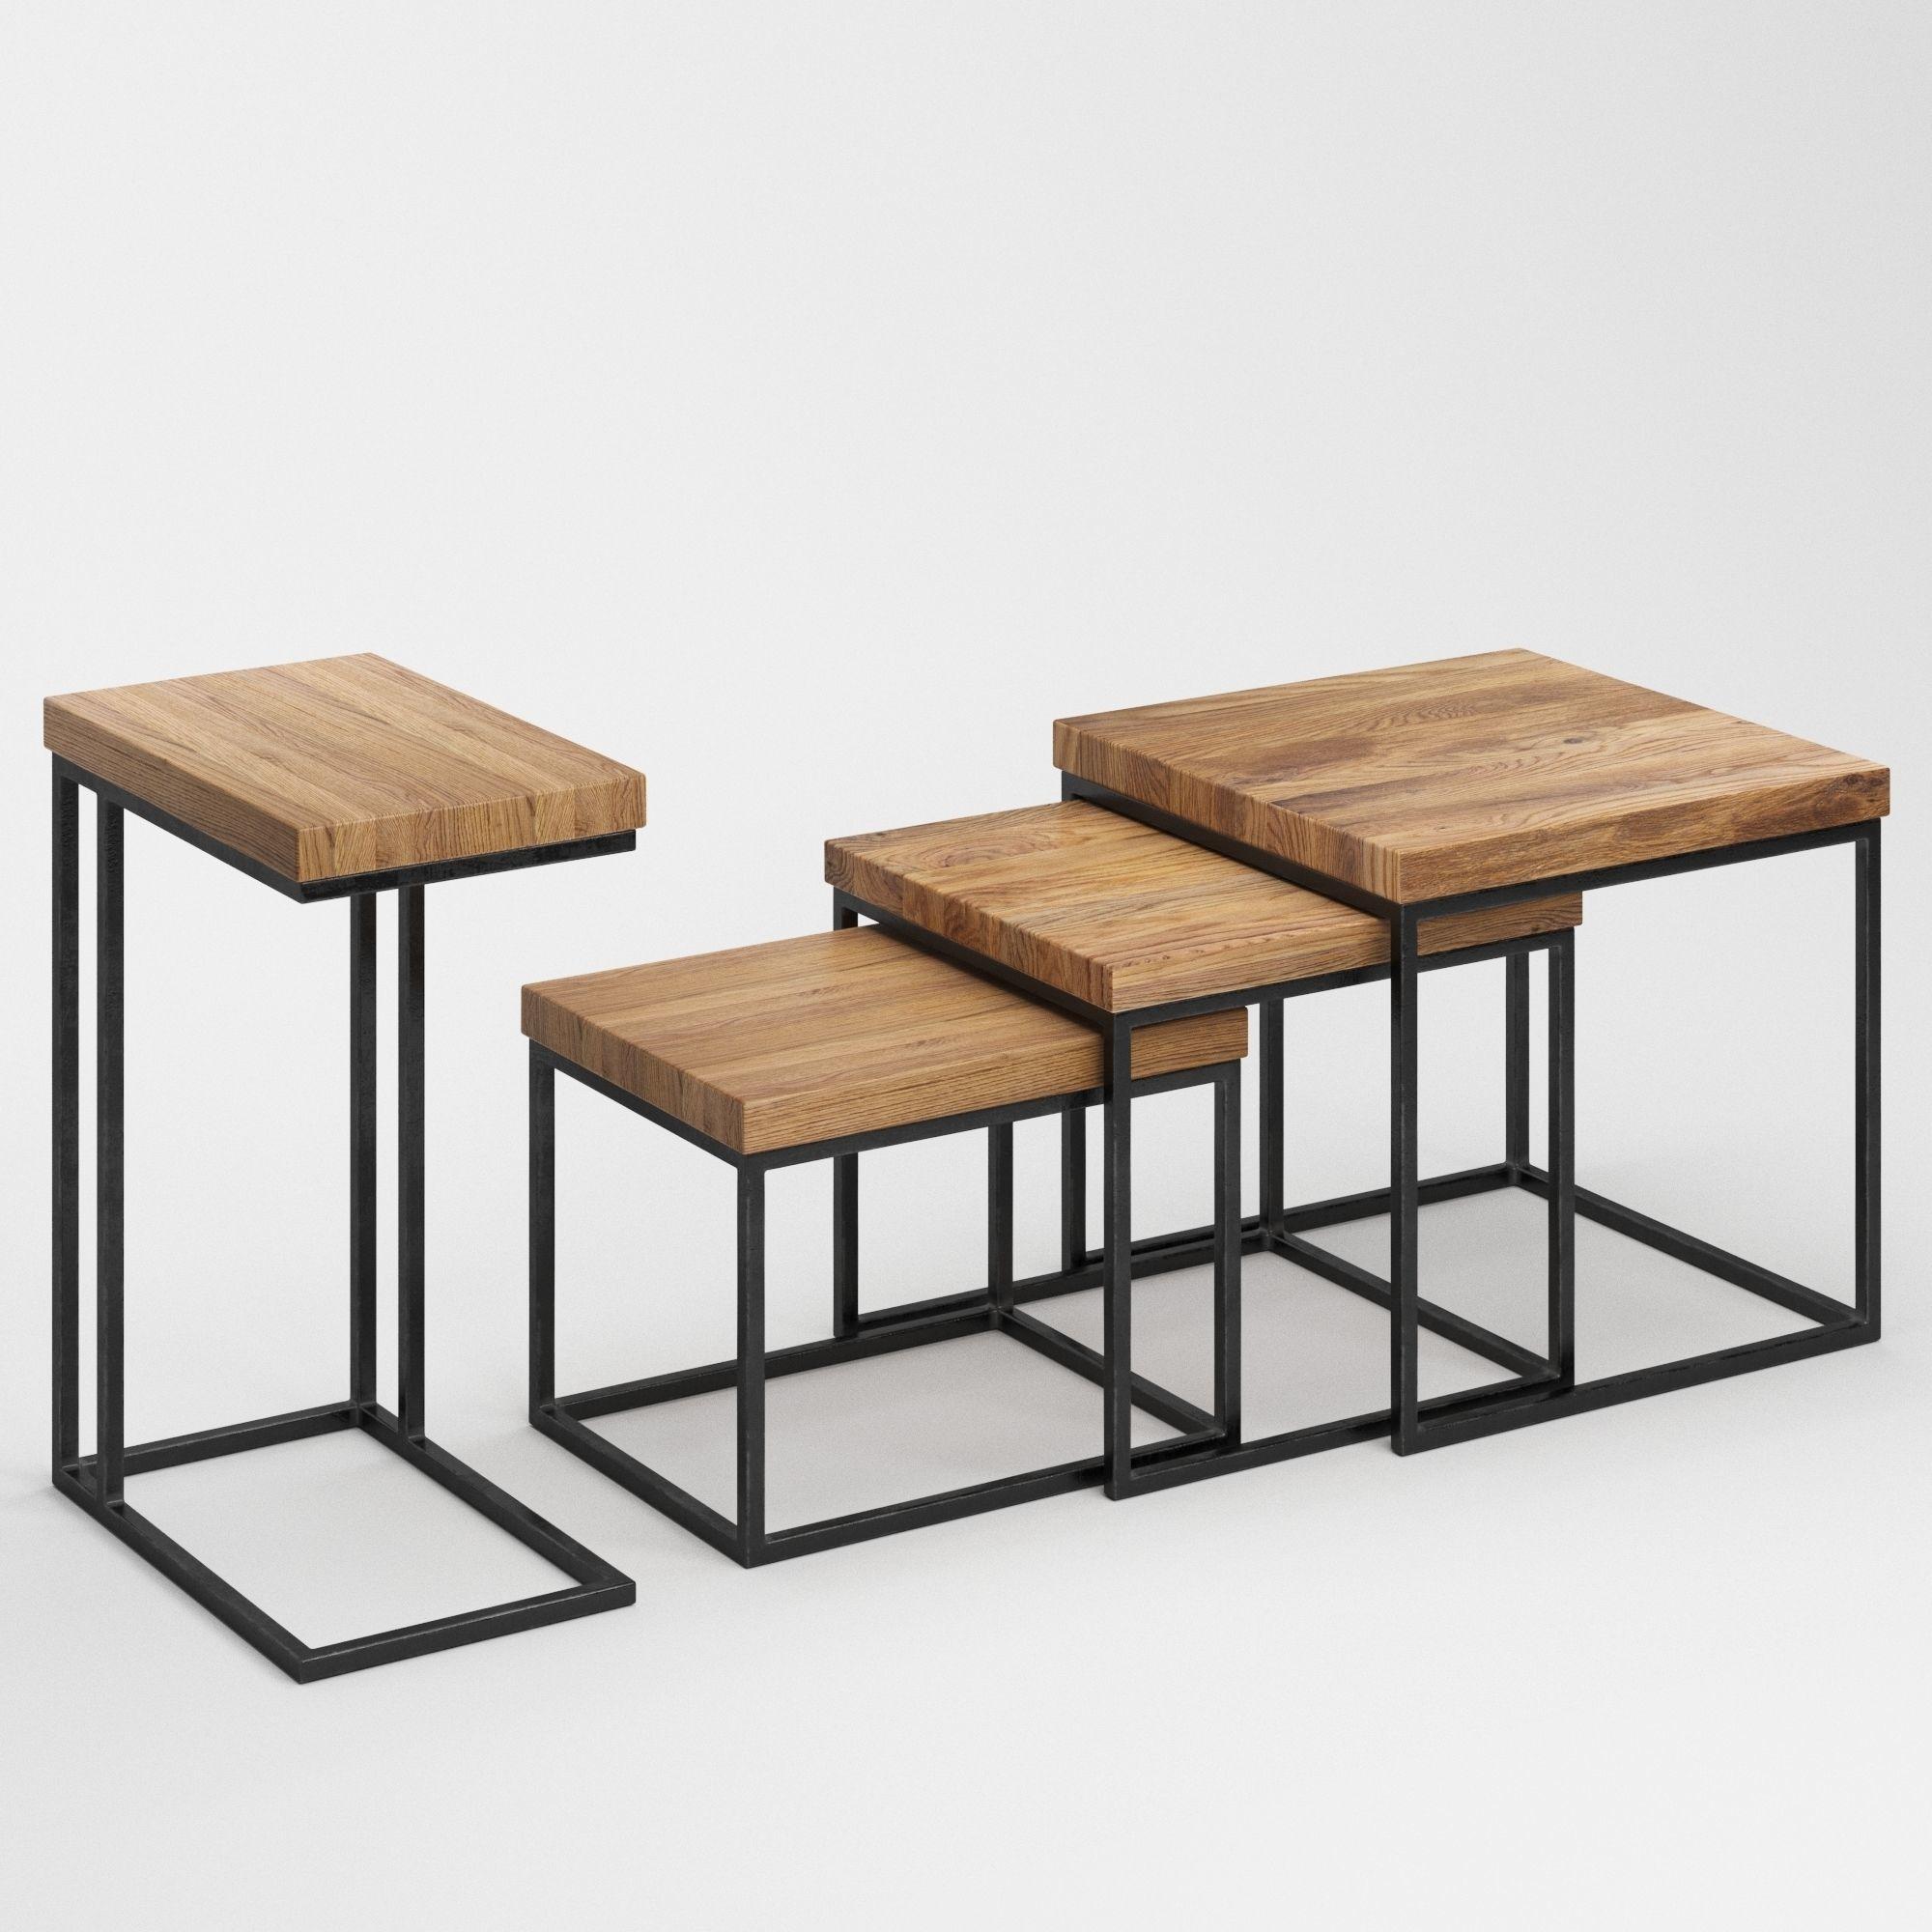 Beau ... Taiga Oak Nesting Table 3d Model Max Obj Fbx Mtl Mat 3 ...